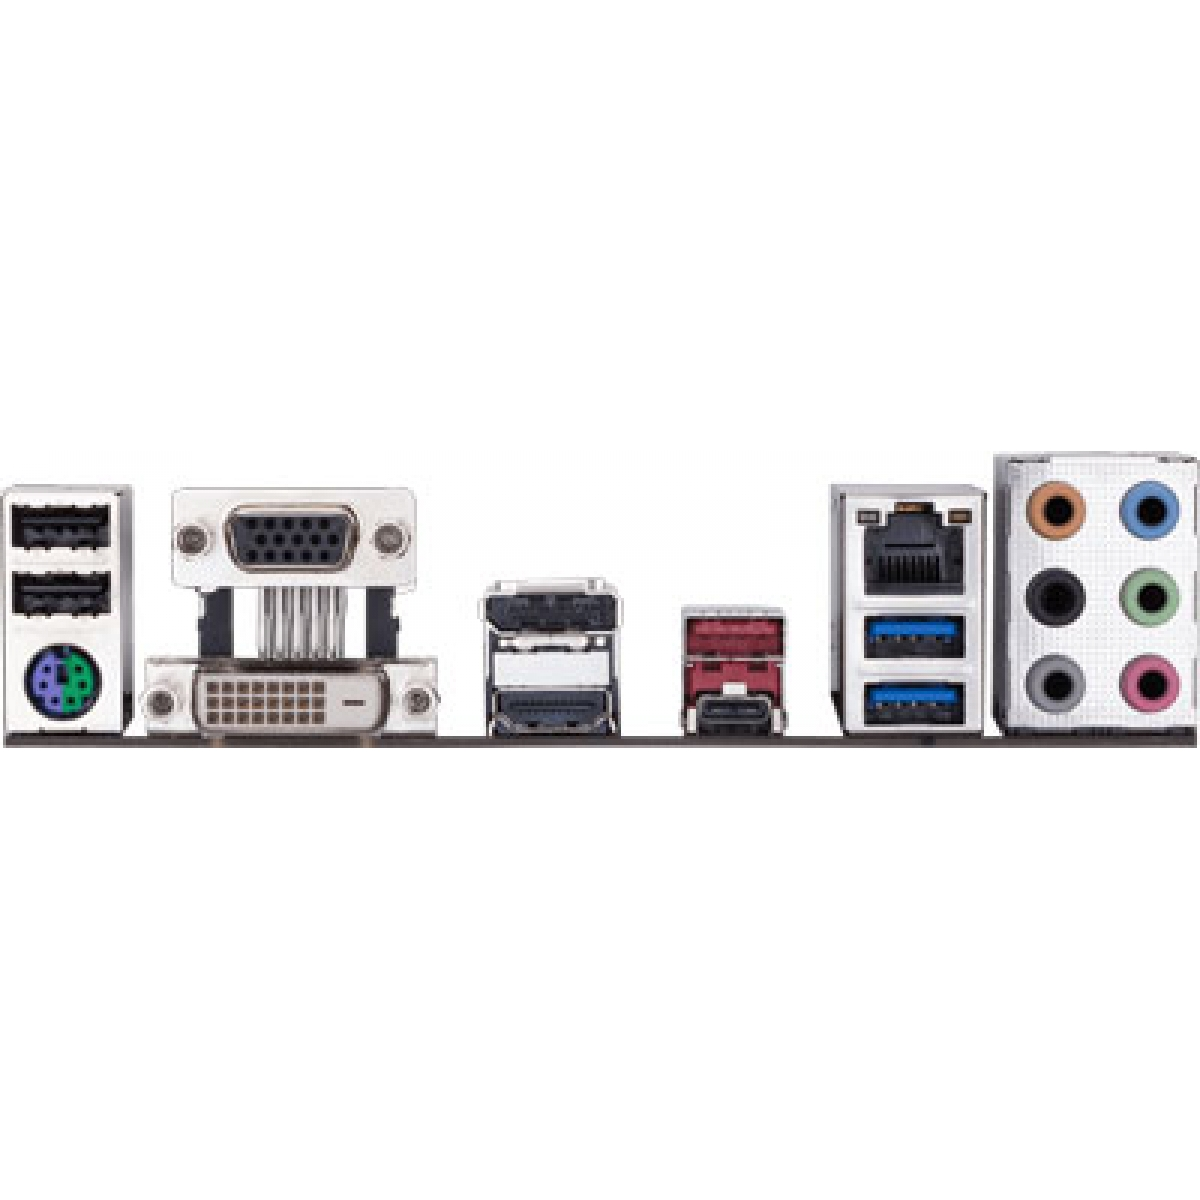 Placa Mãe Gigabyte B360M D3H, Chipset B360, Intel LGA 1151, mATX, DDR4